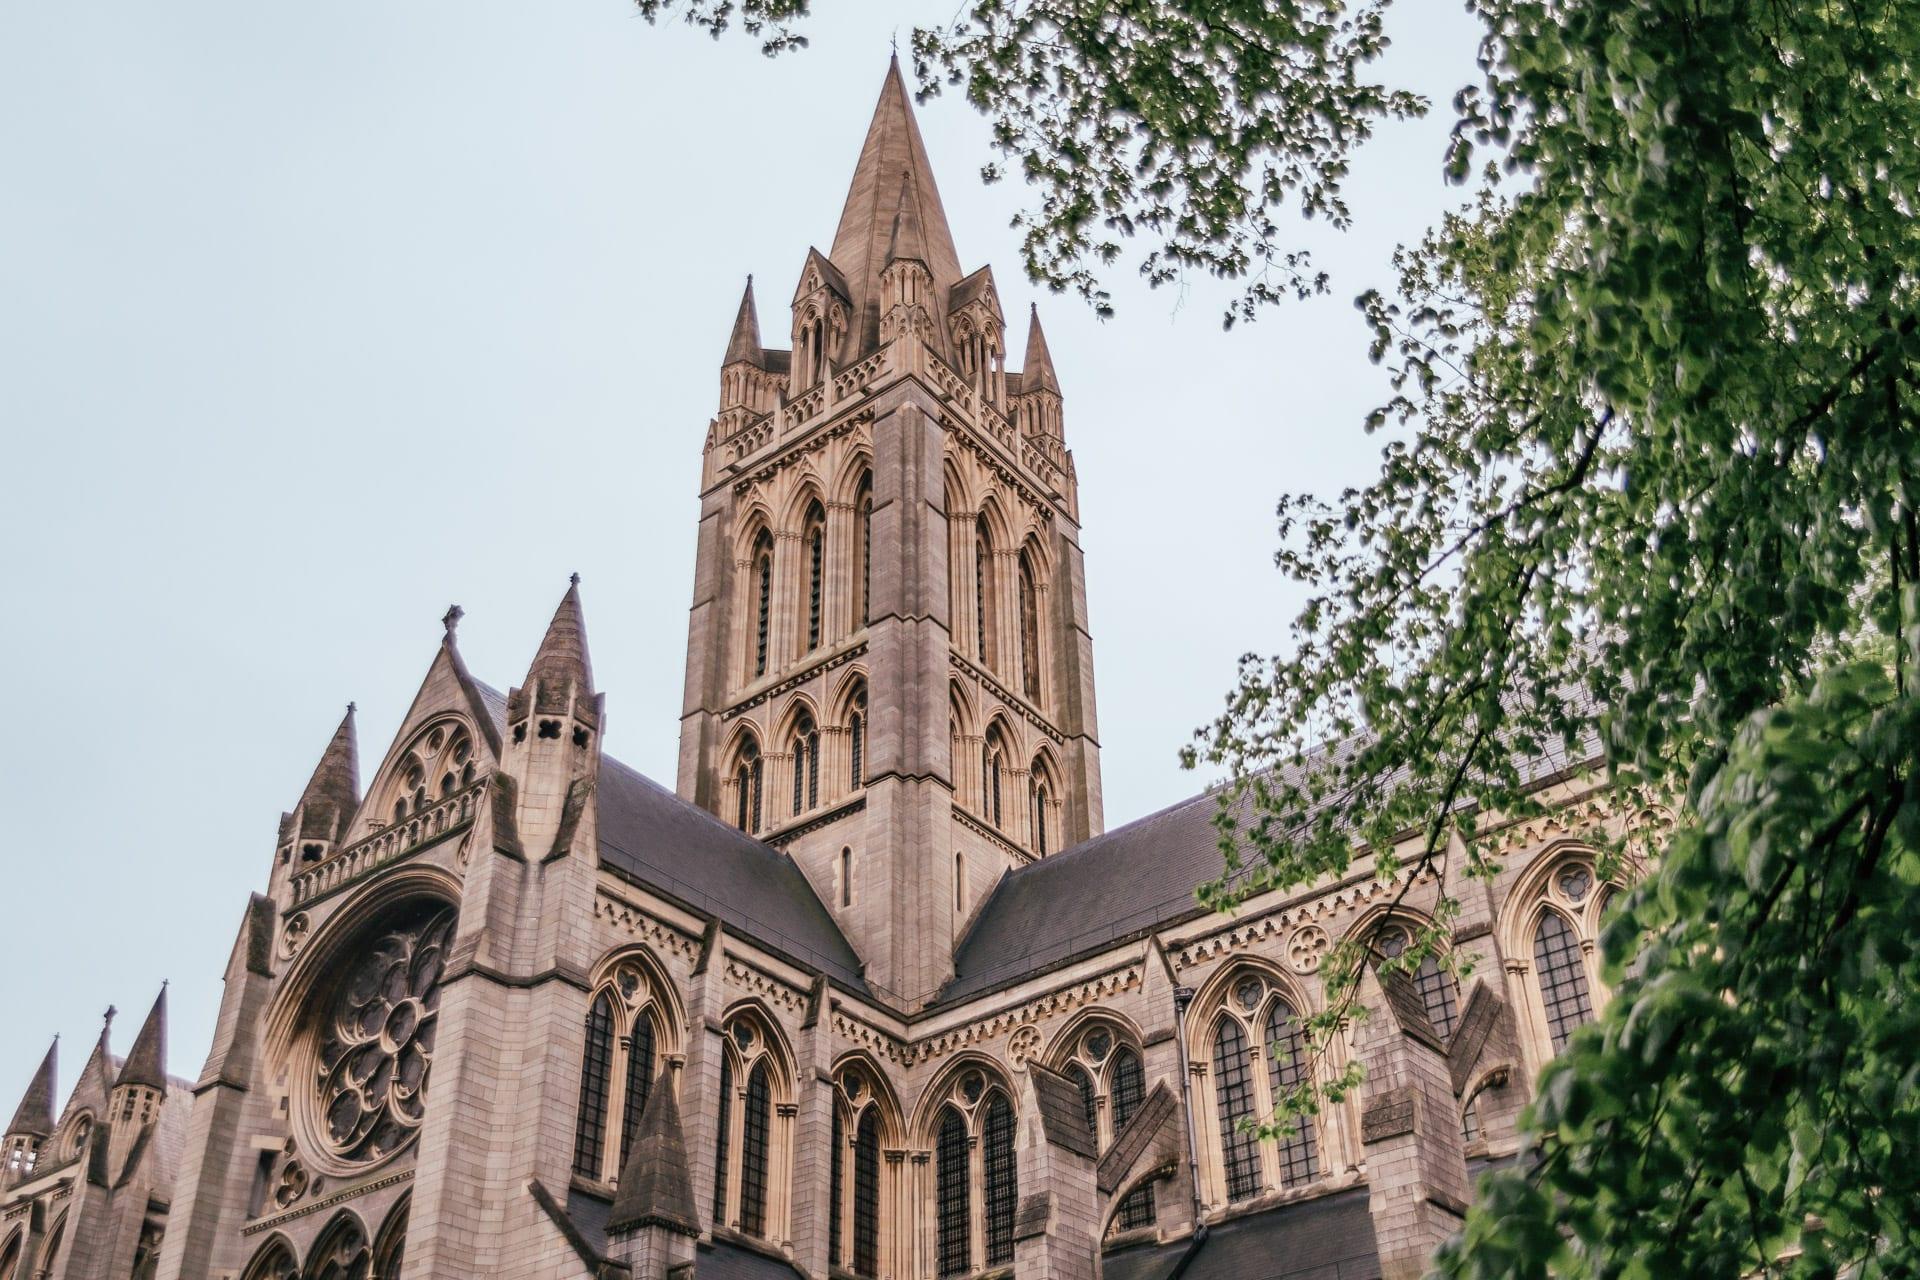 Truros katedral i Cornwall, England, Storbritannien